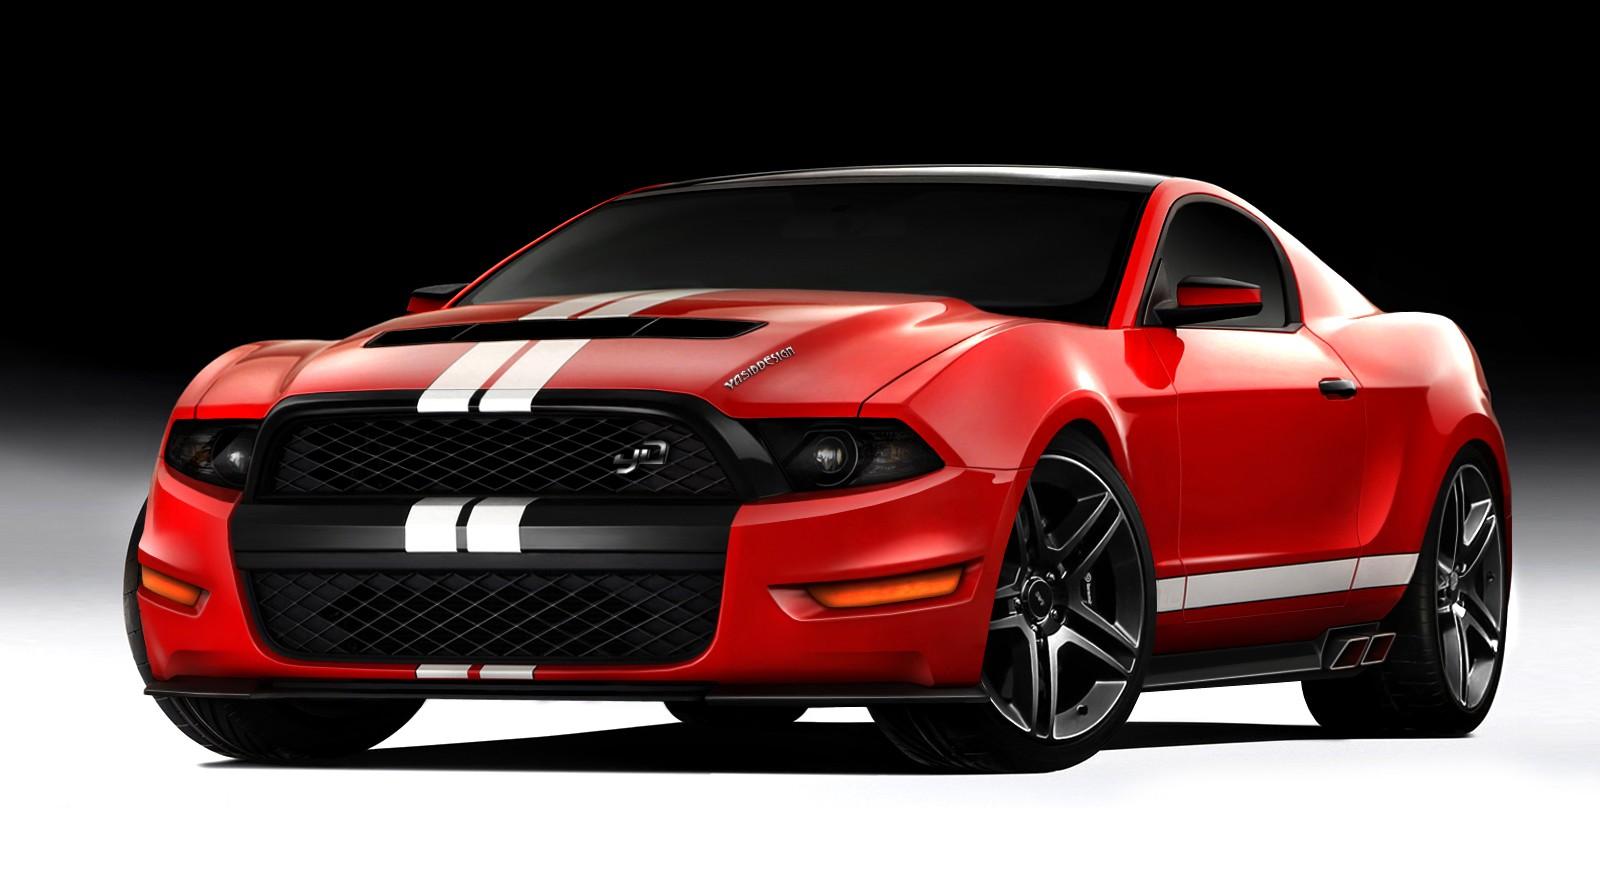 Mauserfan1910 Images 2014 Ford Mustang Gt Hd Wallpaper Hd Wallpaper